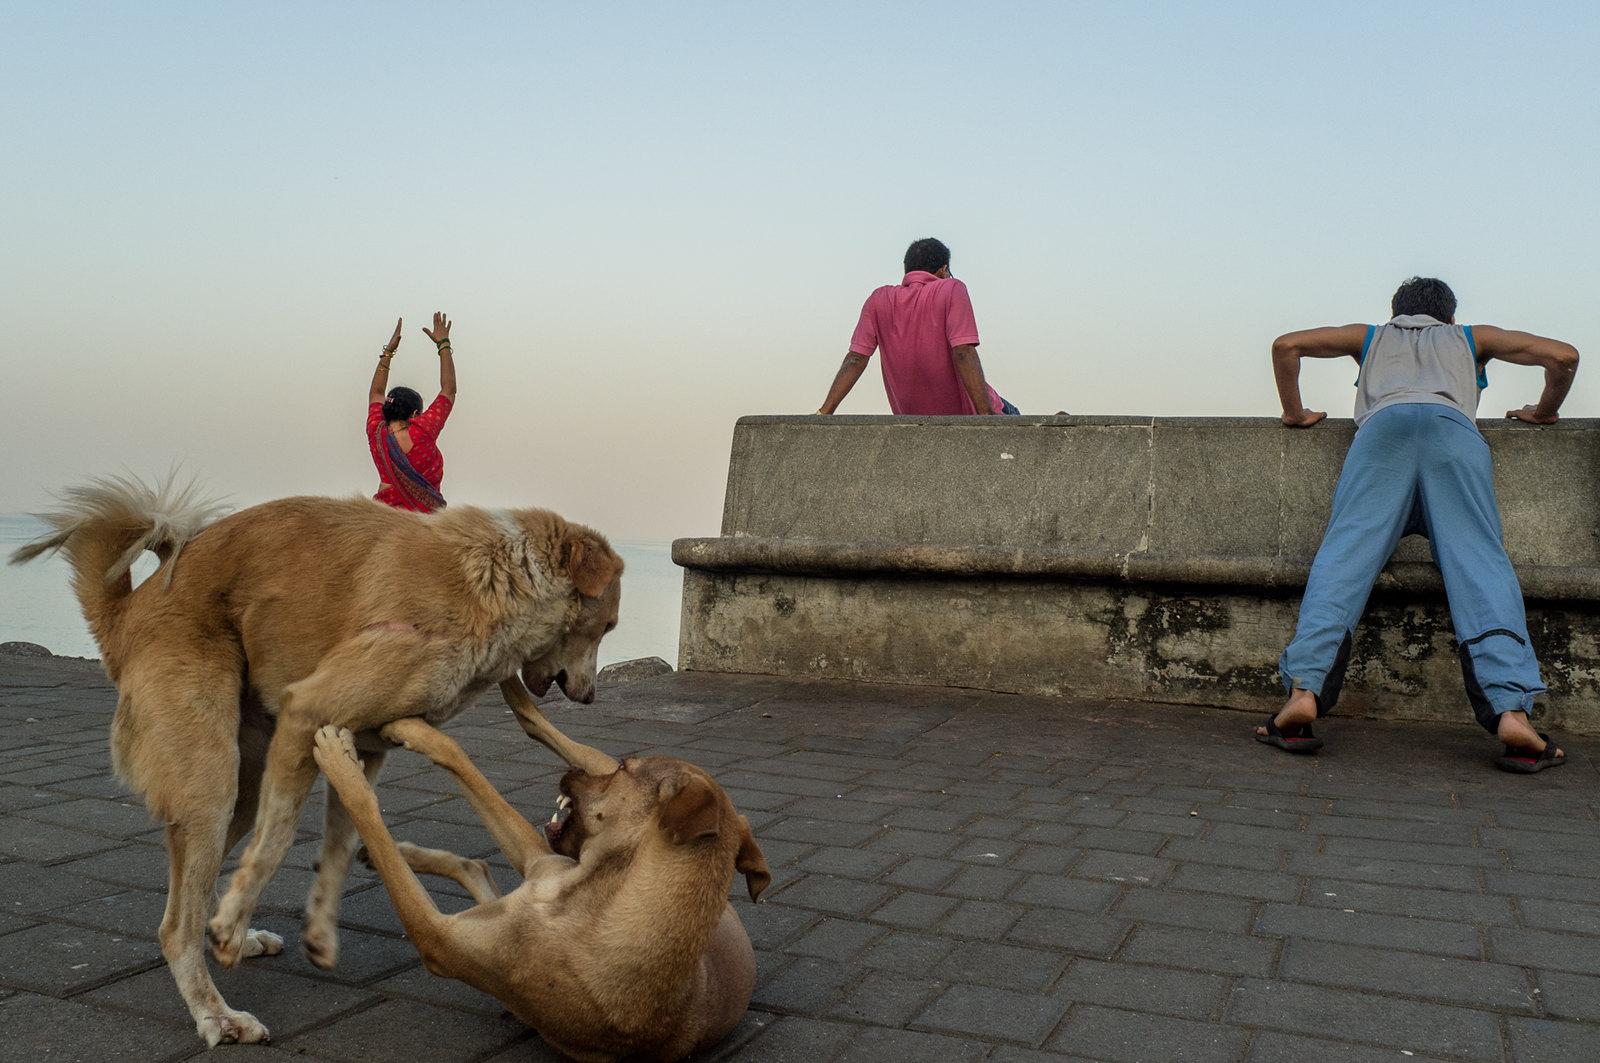 Marine Drive, Mumbai - 2012 | by iontrop